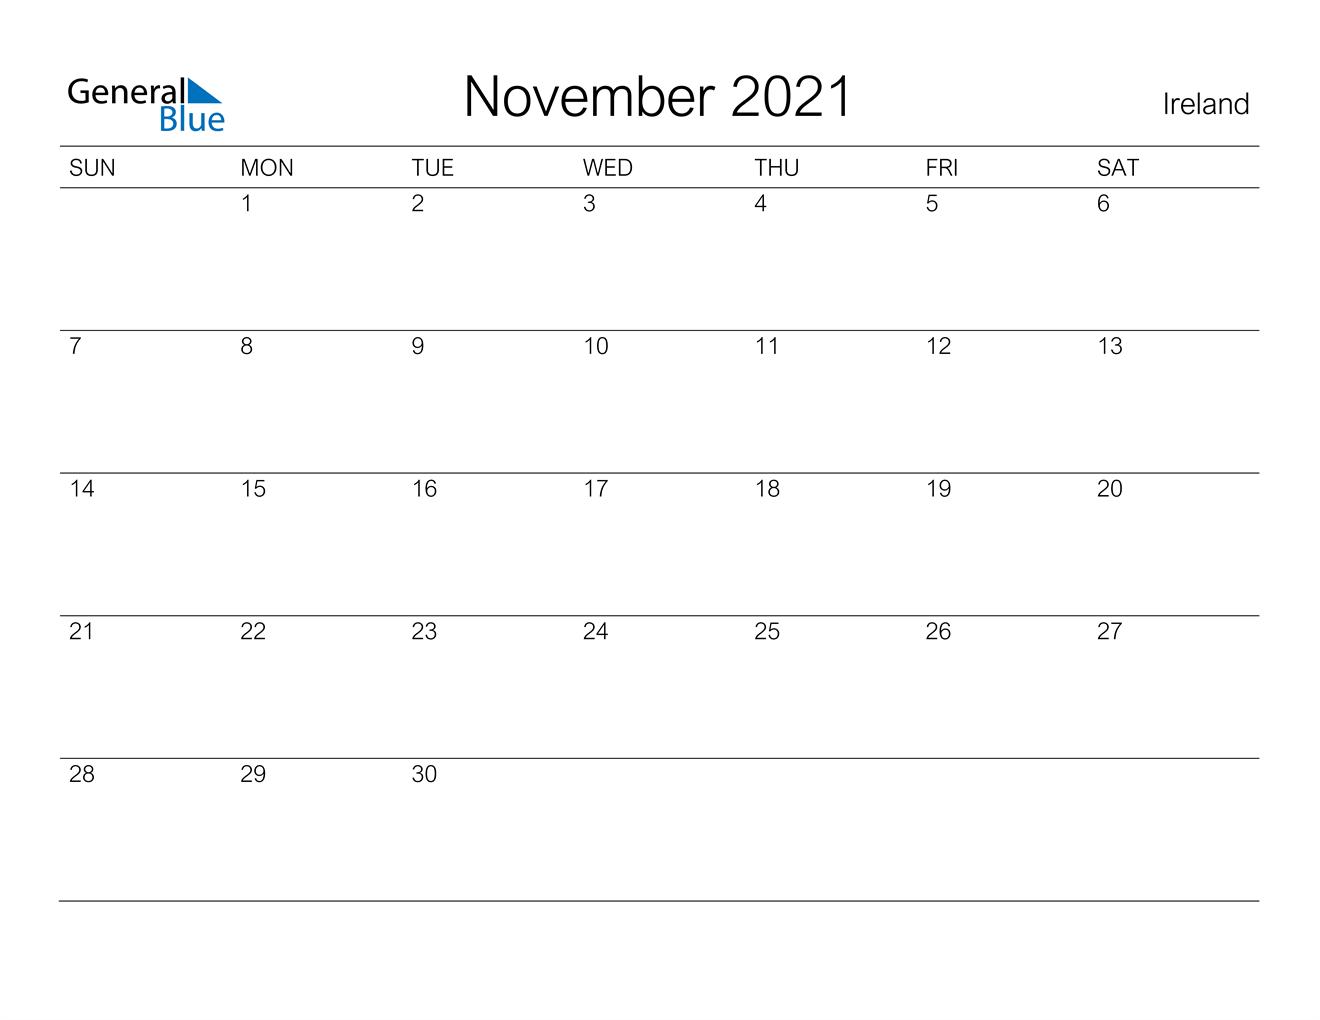 November 2021 Calendar - Ireland